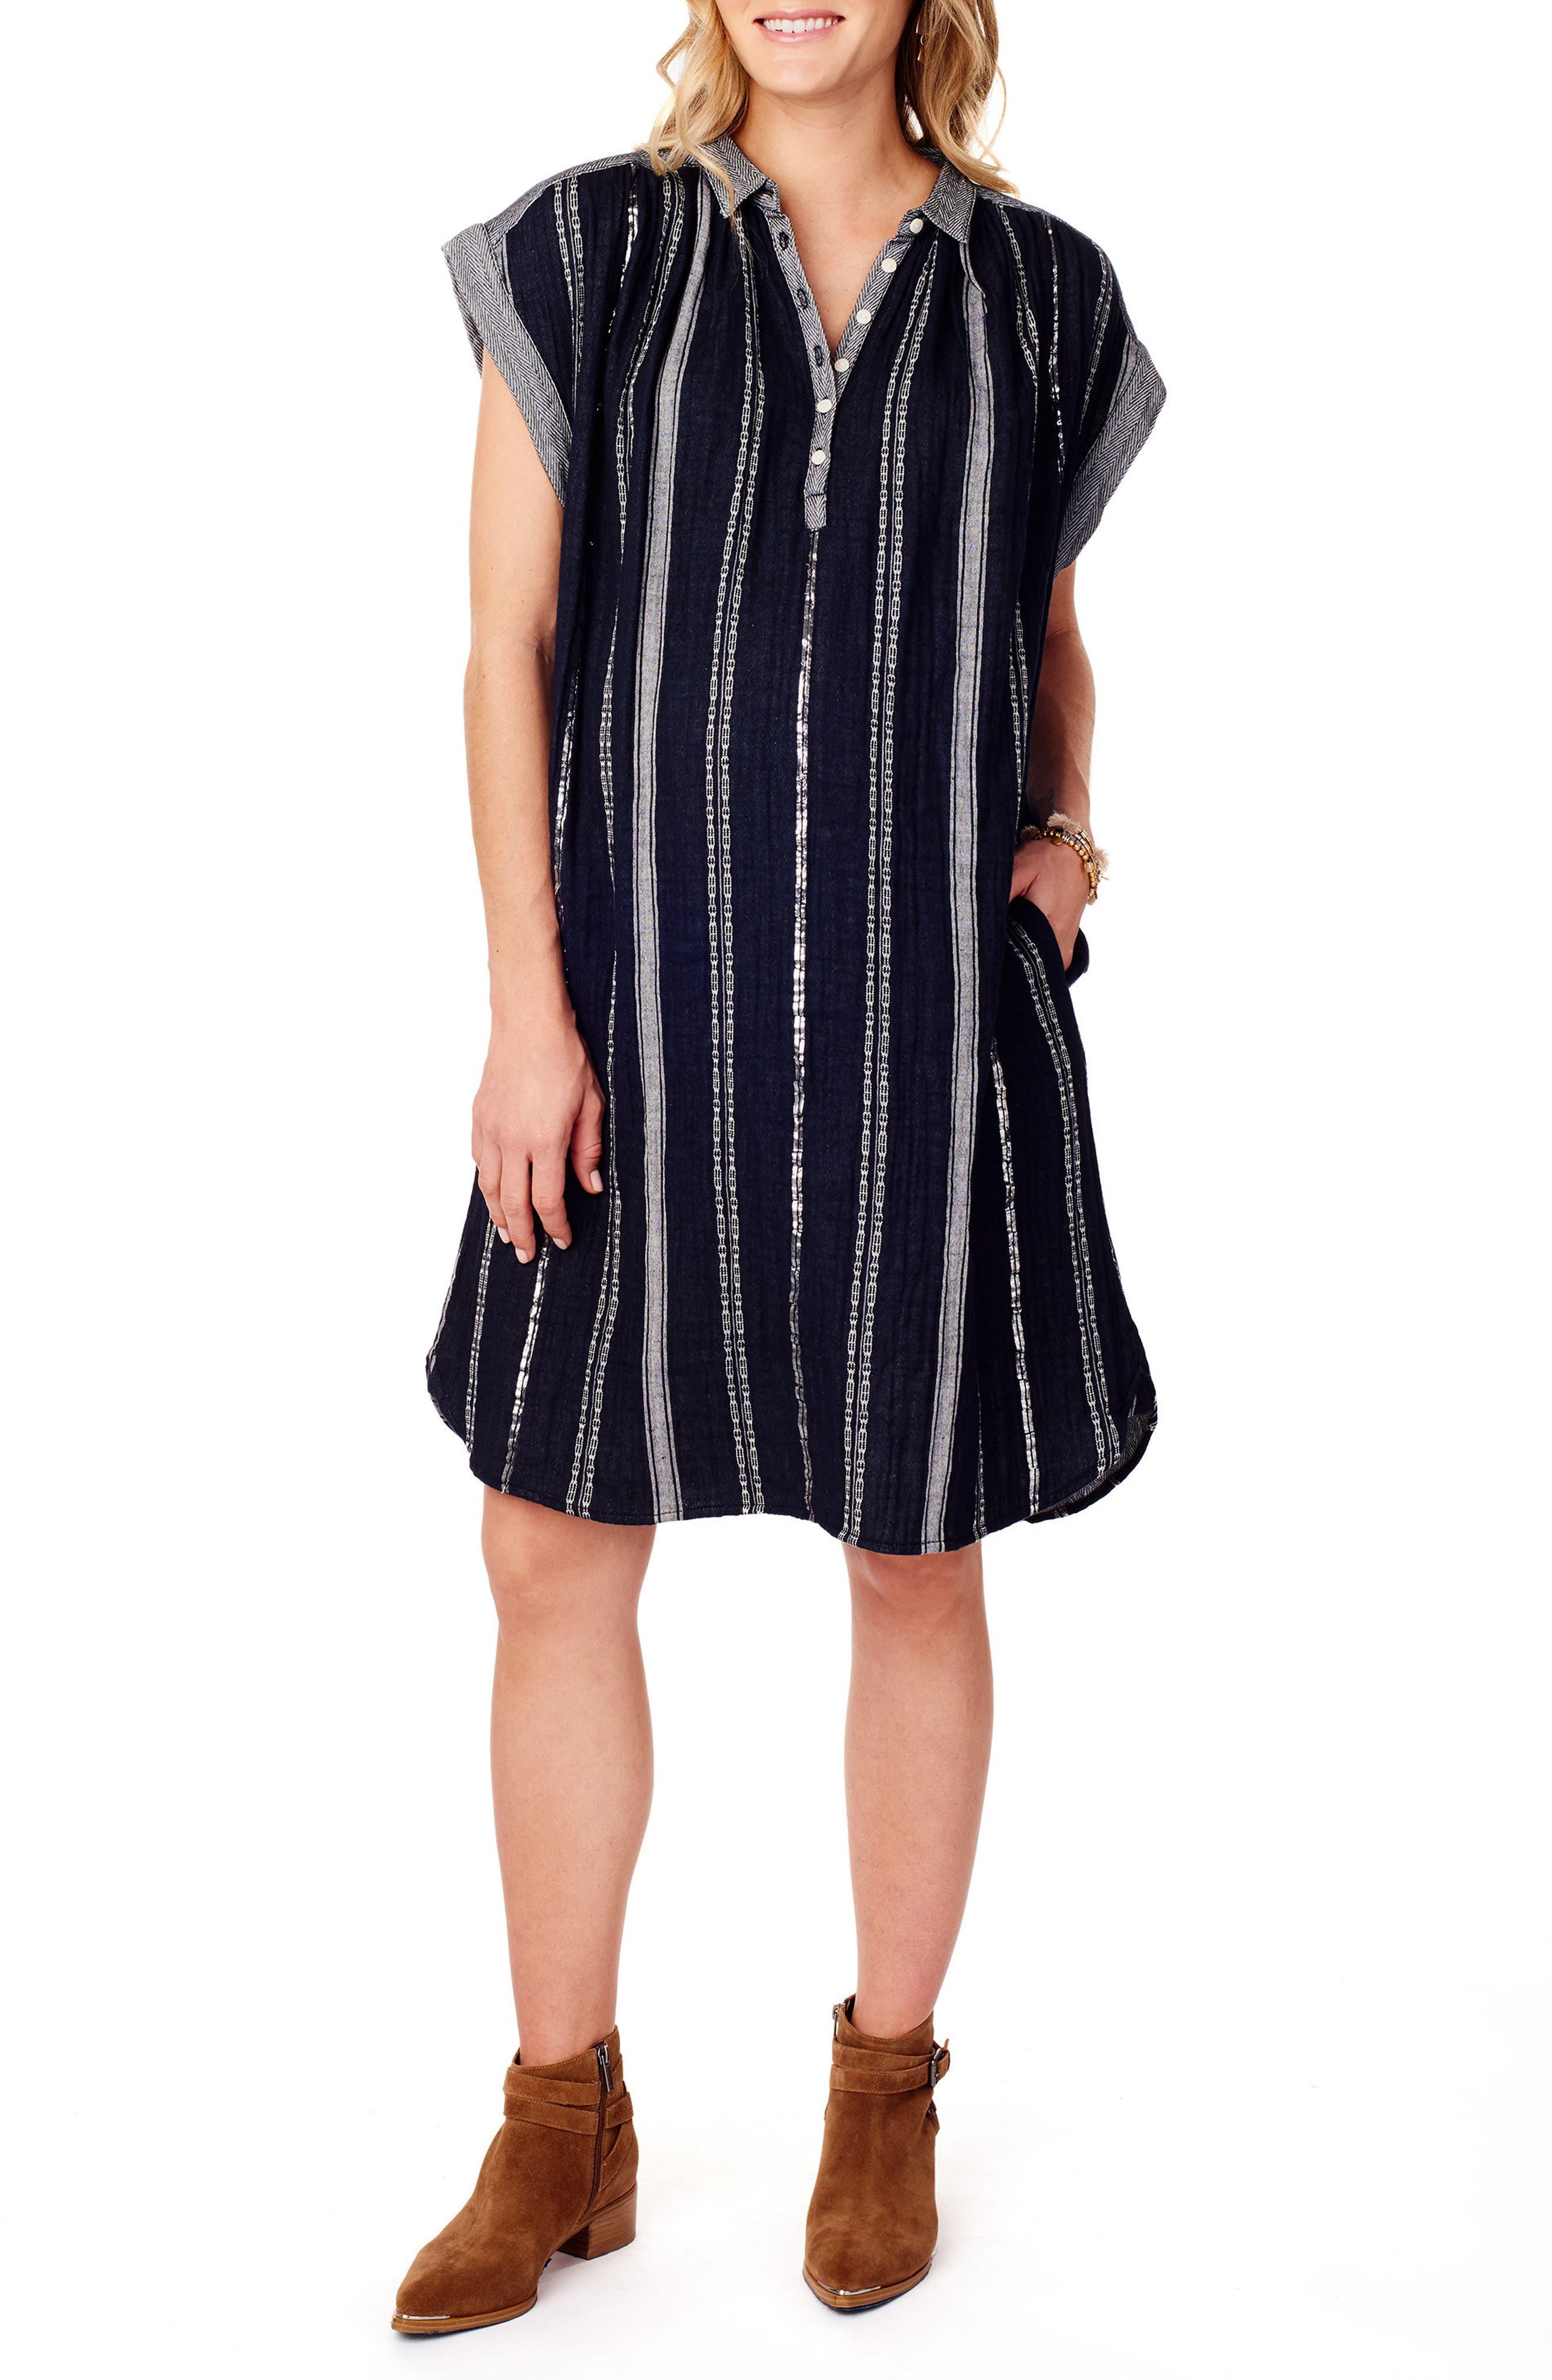 Ingrid & Isabel Maternity Shift Dress,                         Main,                         color, True Navy Lurex Stripe